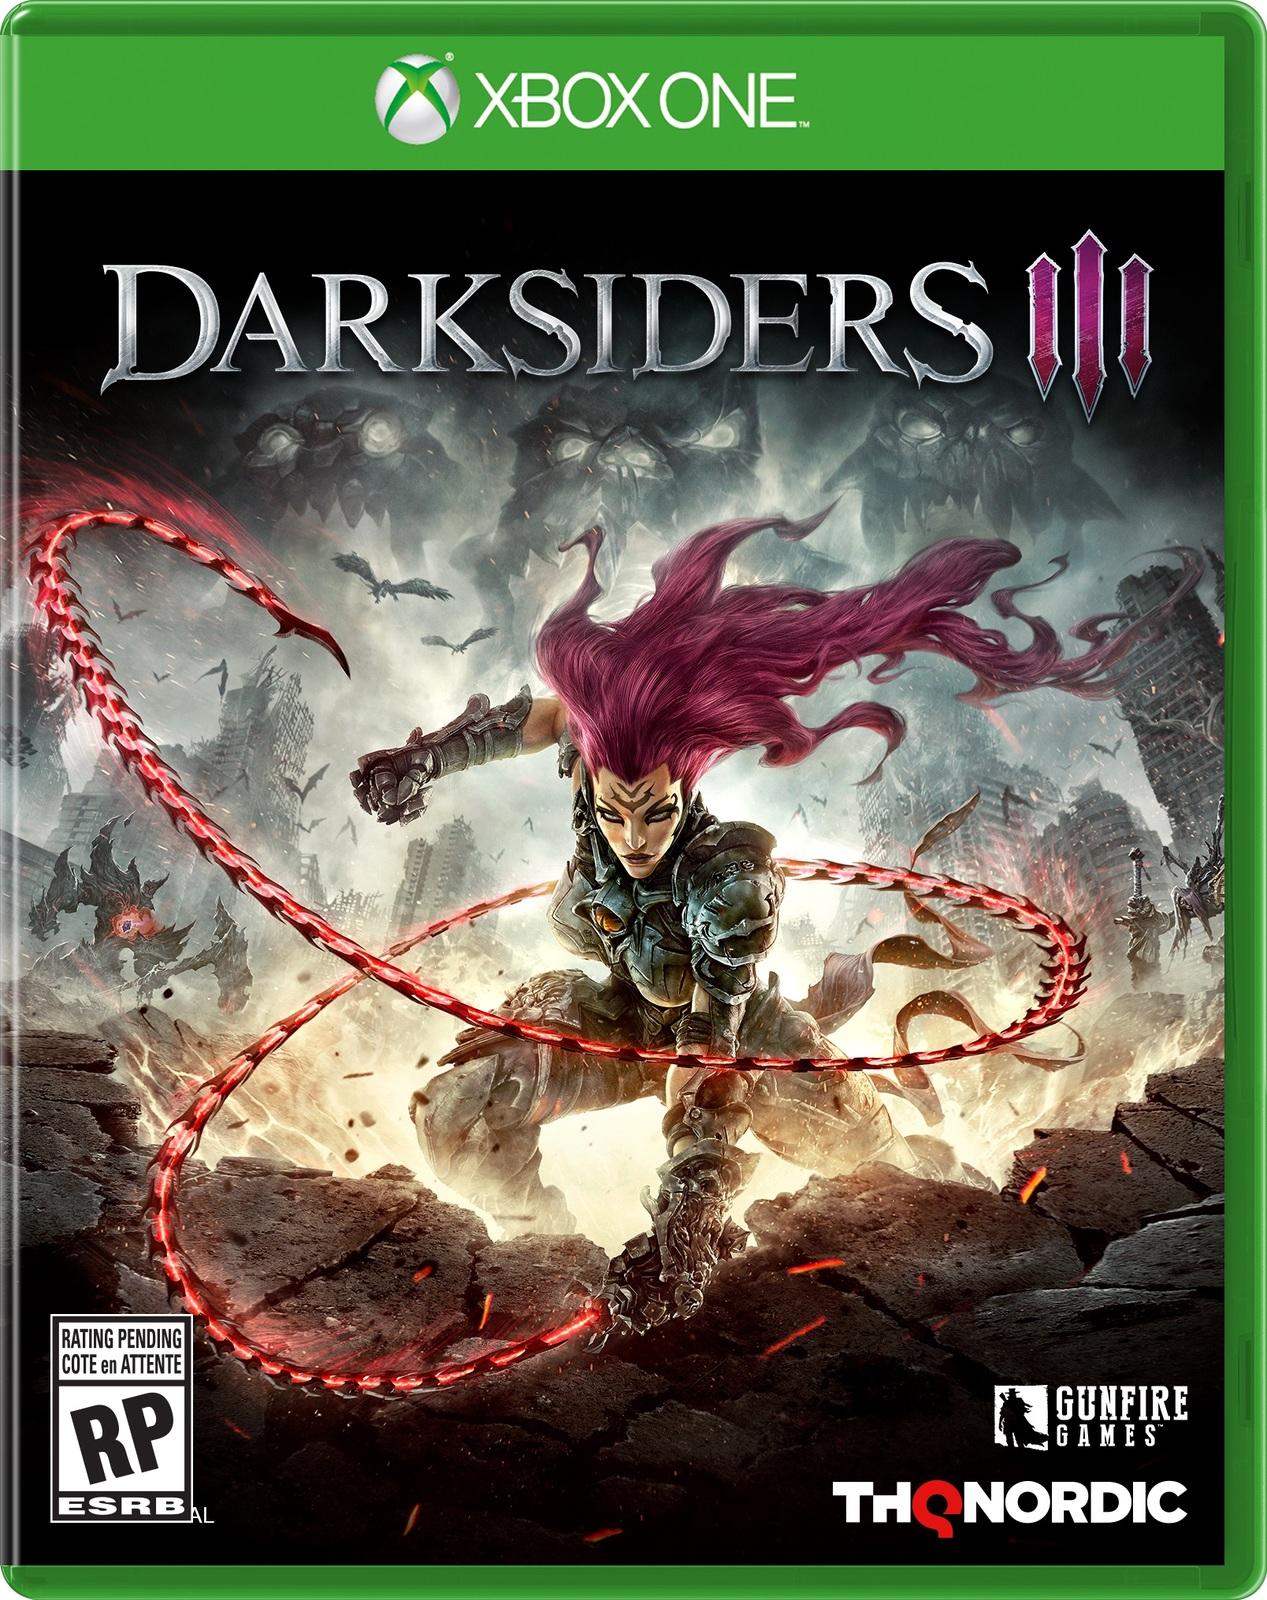 Darksiders III for Xbox One image